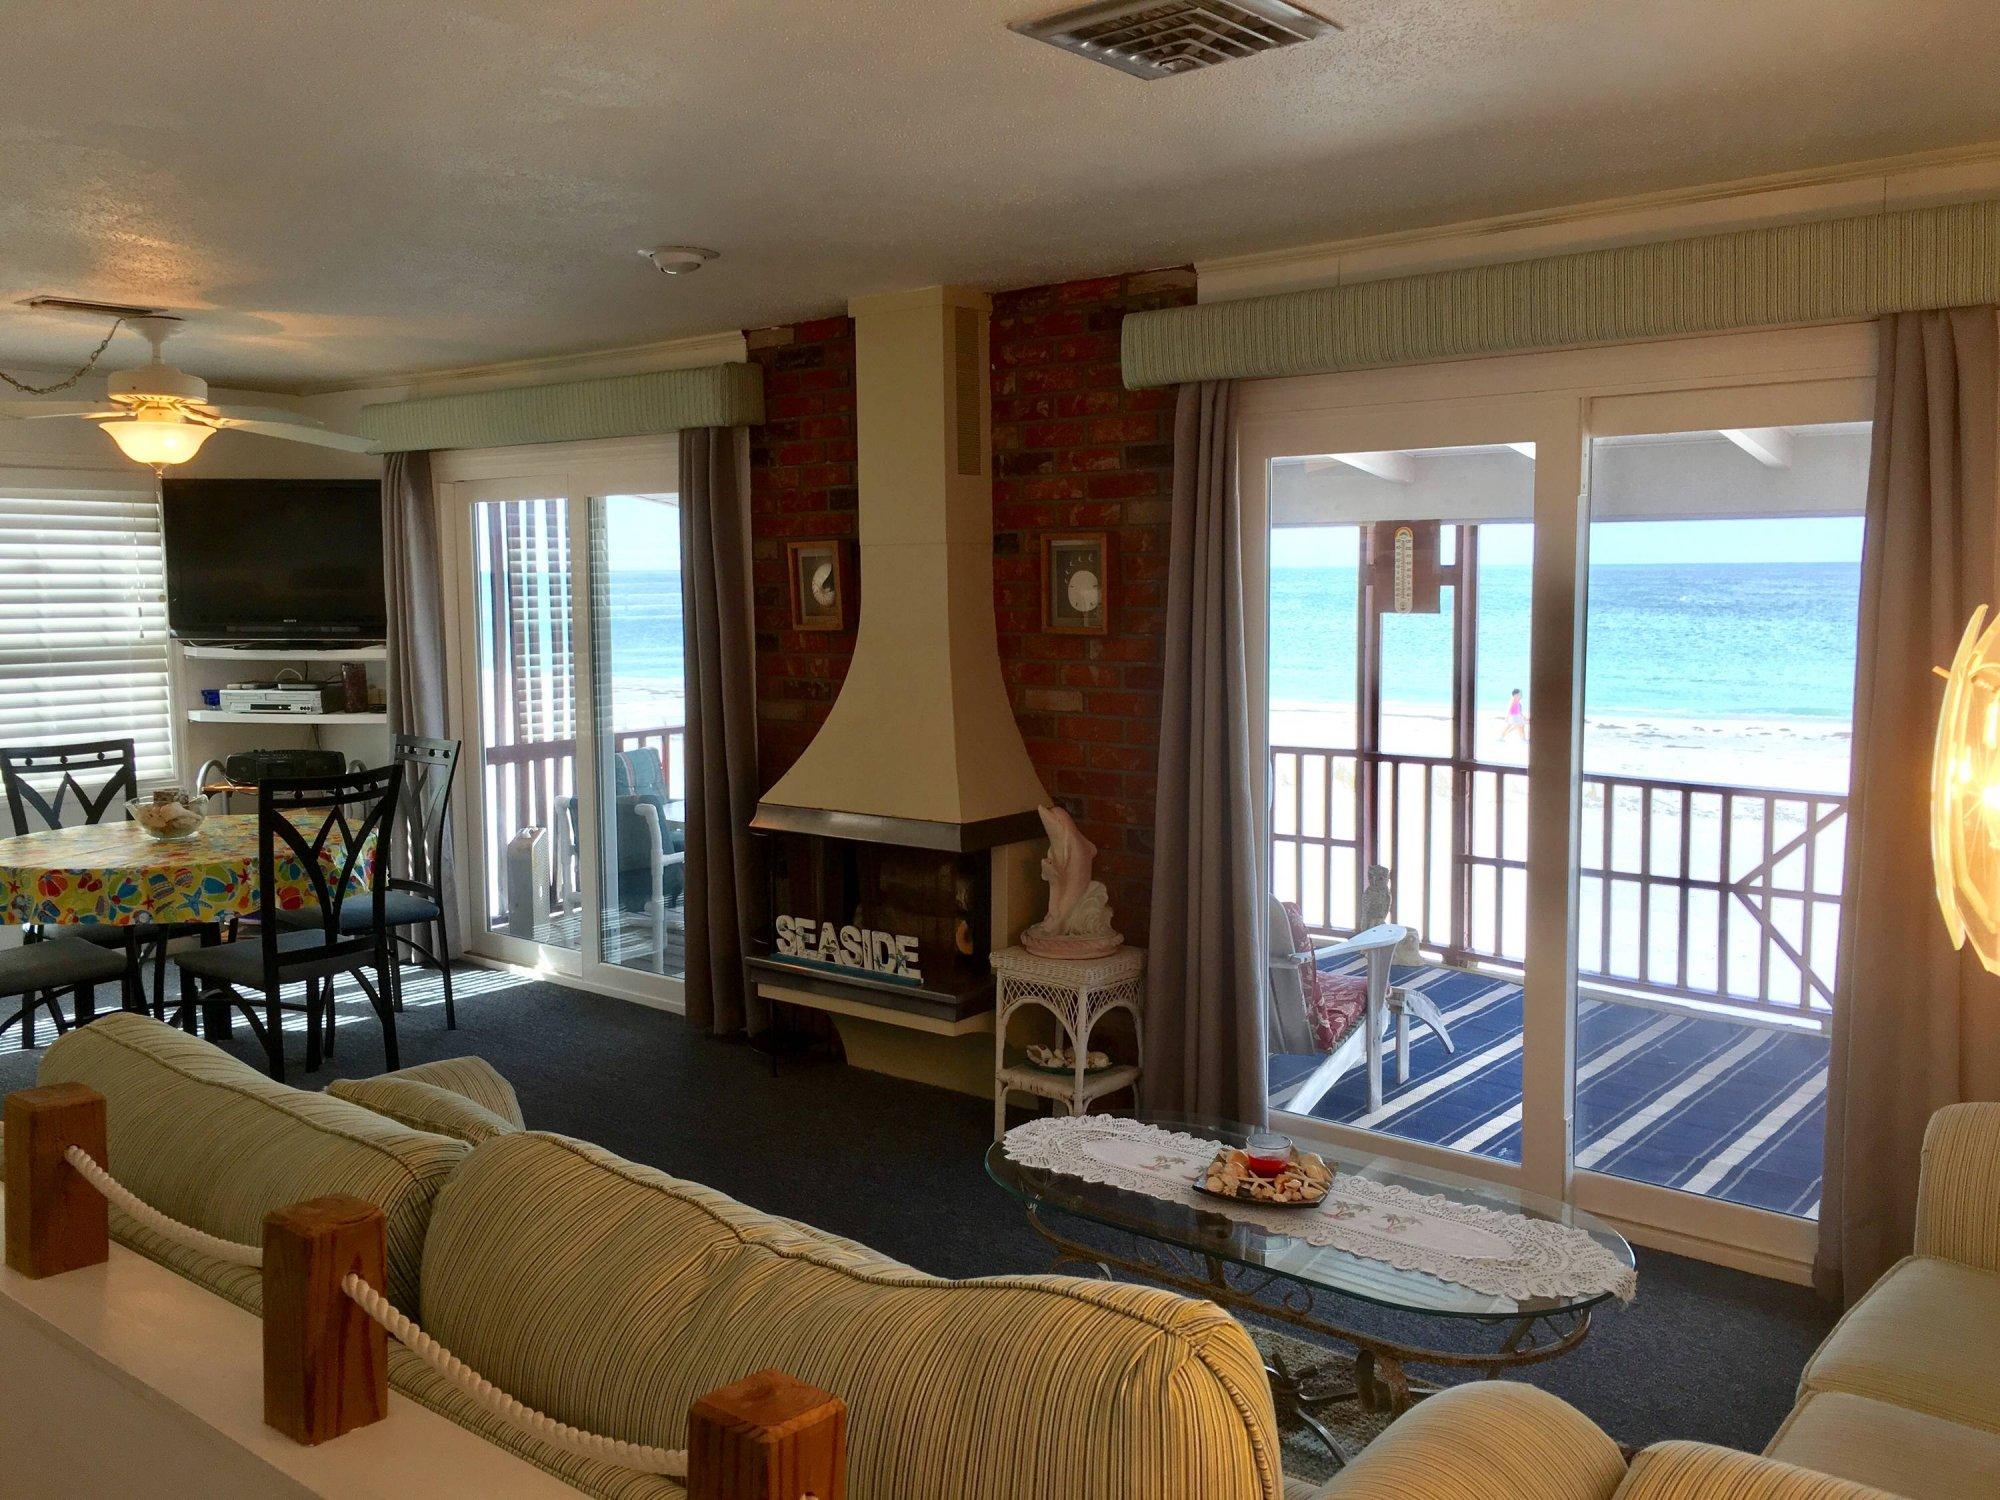 Beachfront Bungalow - Indian Rocks Beach Vacation Rentals | Carter